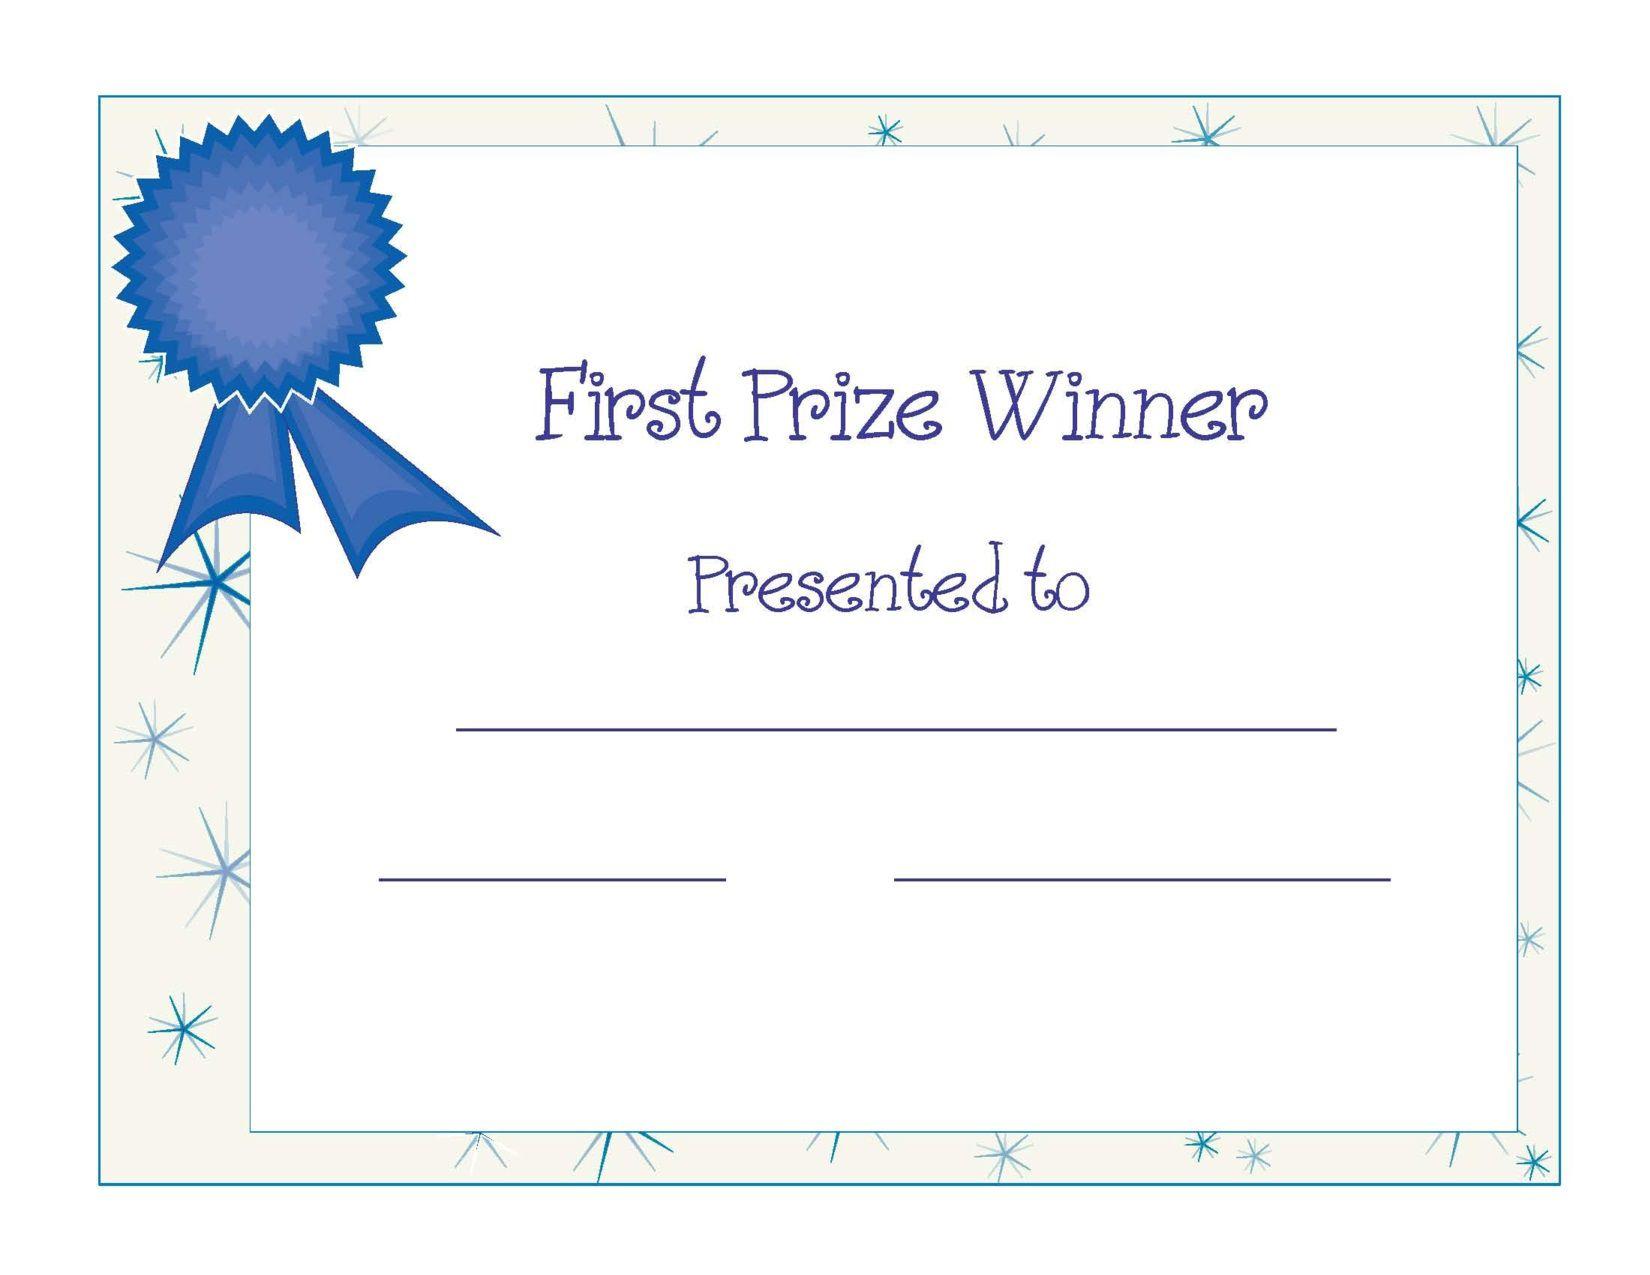 000 Fearsome Blank Award Certificate Template Image  Printable Math Editable FreeFull